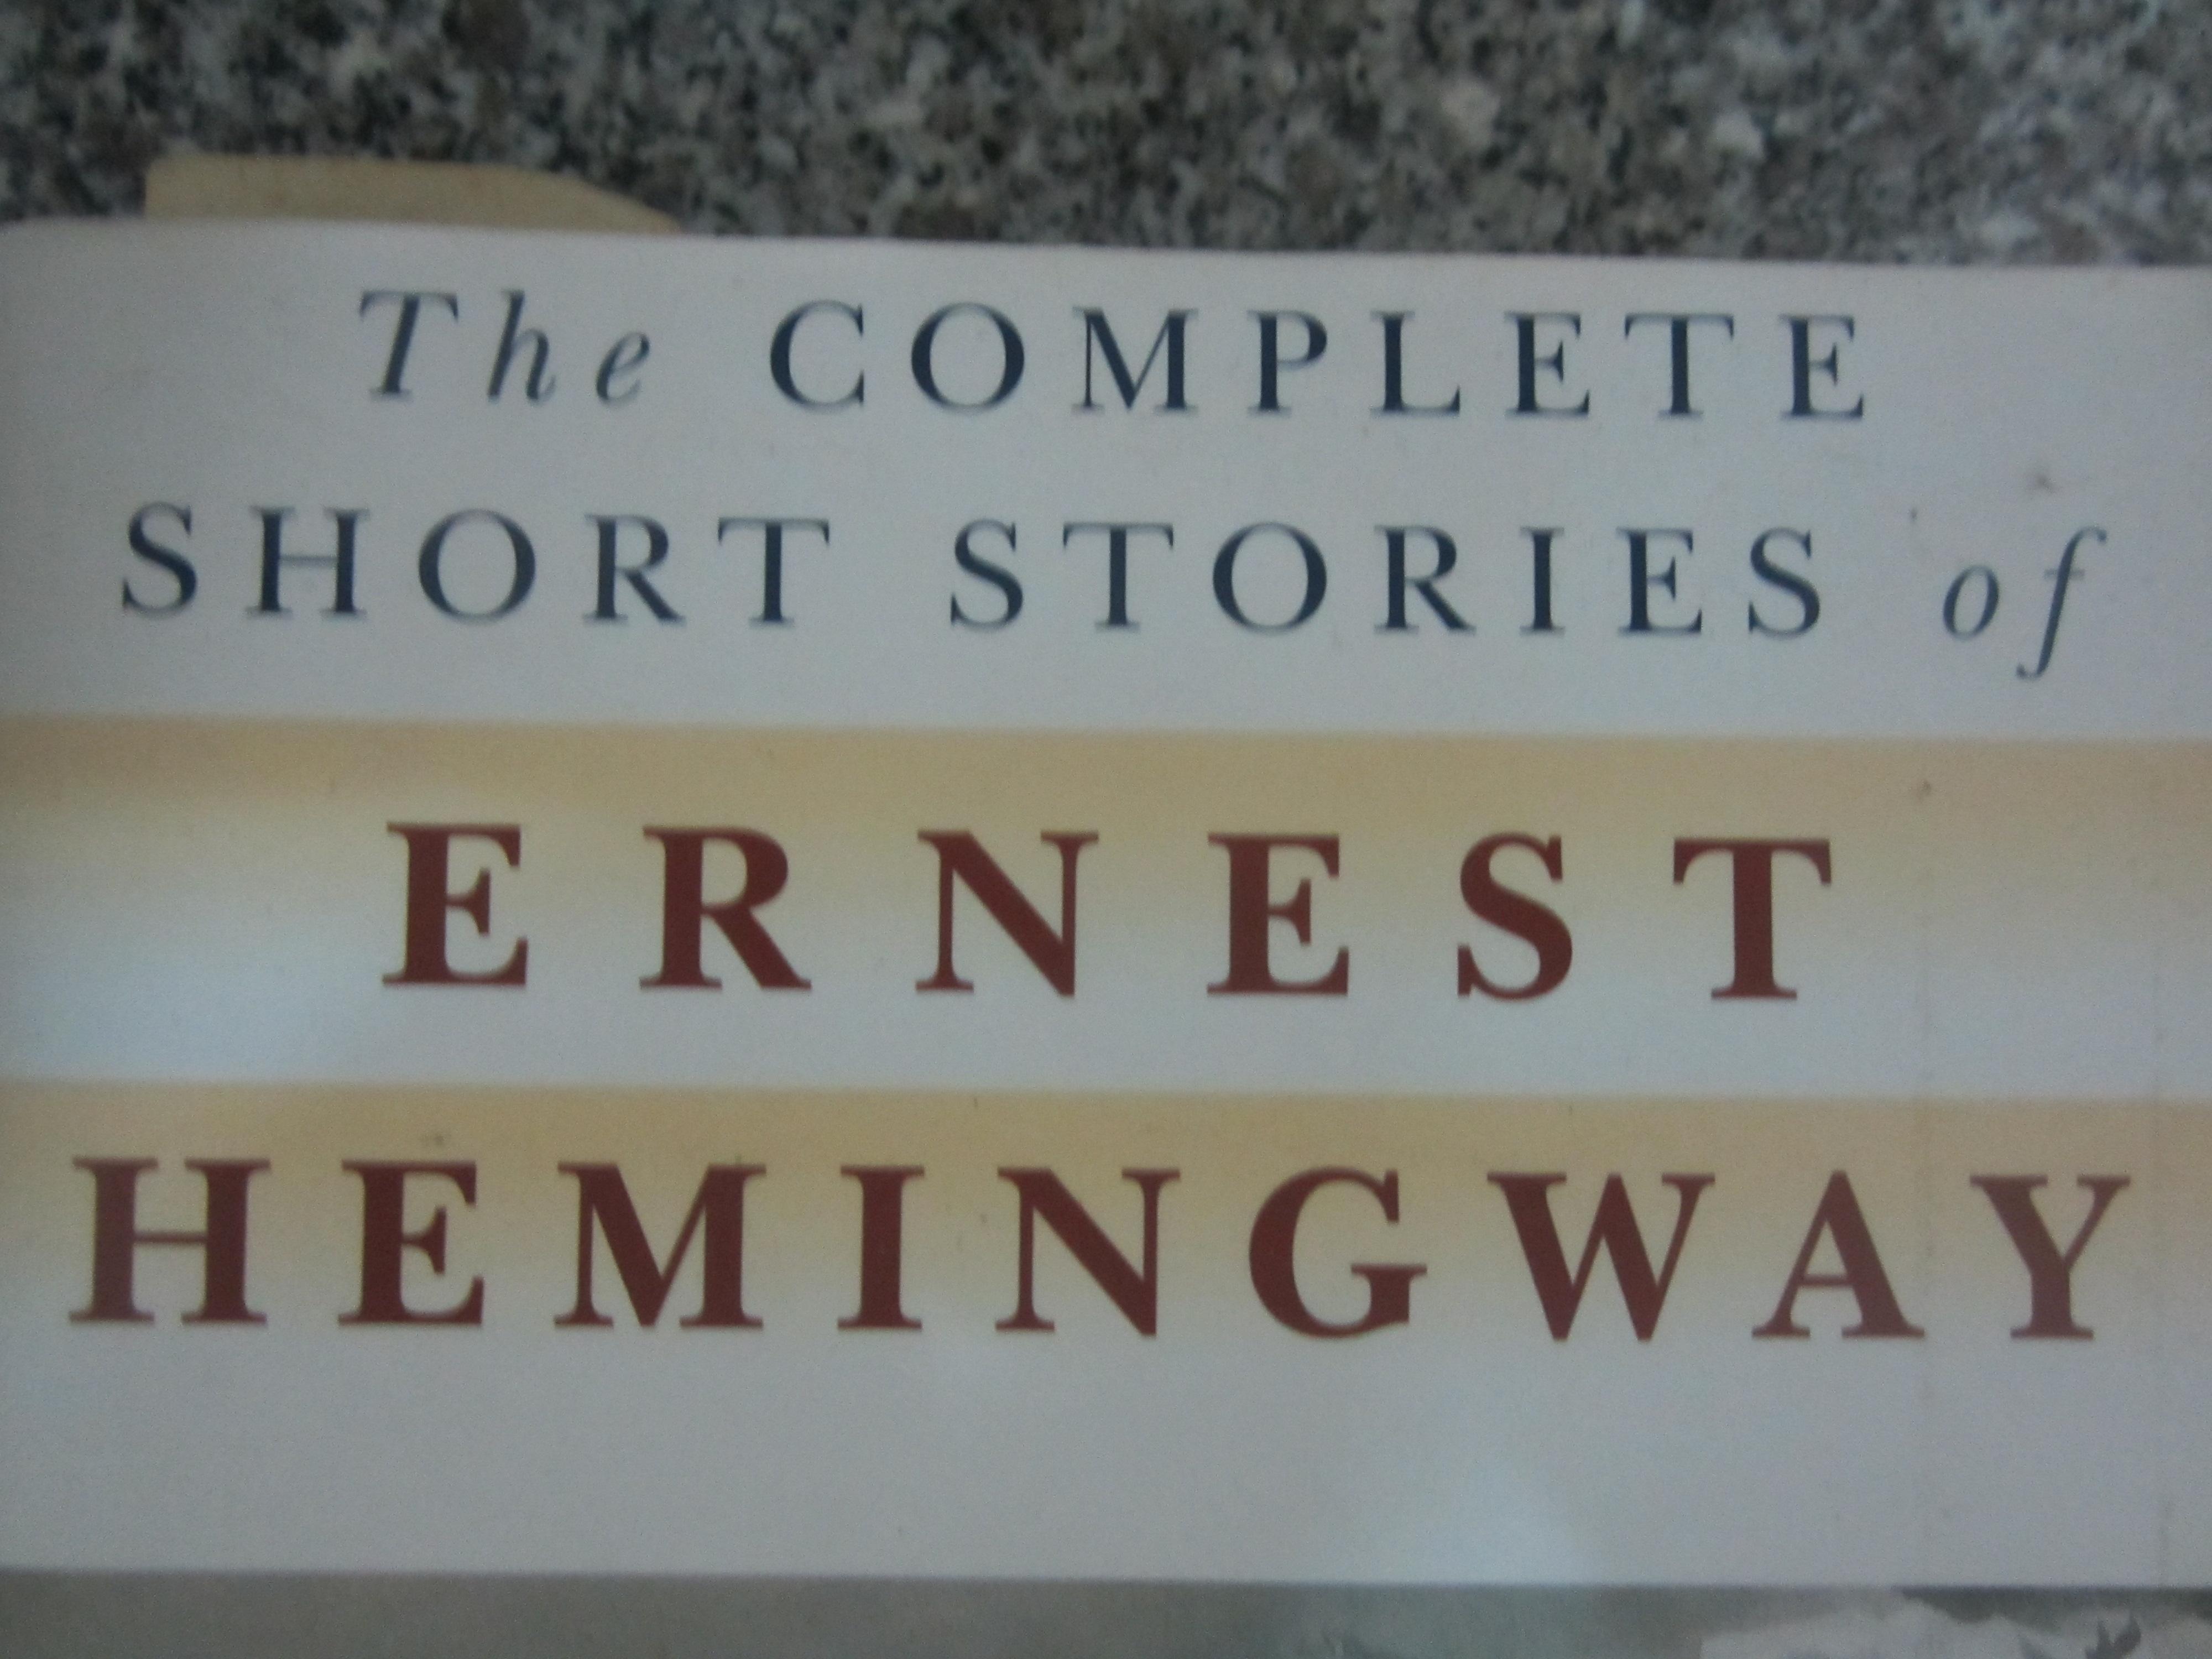 ernest hemingway short essays Ernest hemingway 1899–-1961 american novelist, short story and novella writer, dramatist, poet, journalist, essayist, and memoirist the following entry presents criticism of hemingway's short.